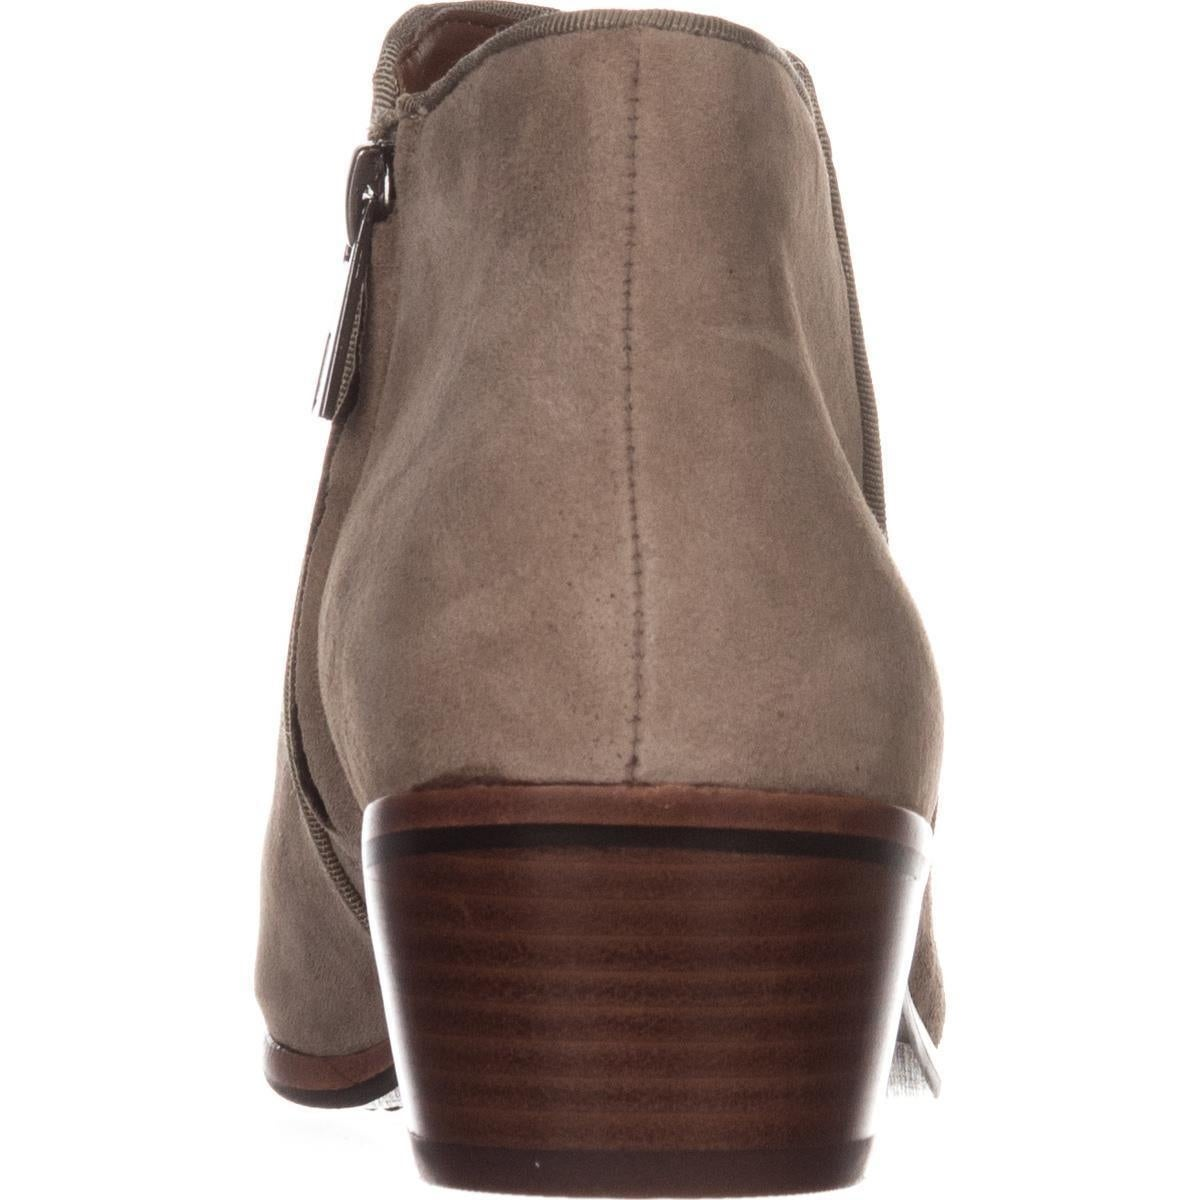 9c2f10f6961b Shop Sam Edelman Petty Short Fleece Lined Ankle Boots